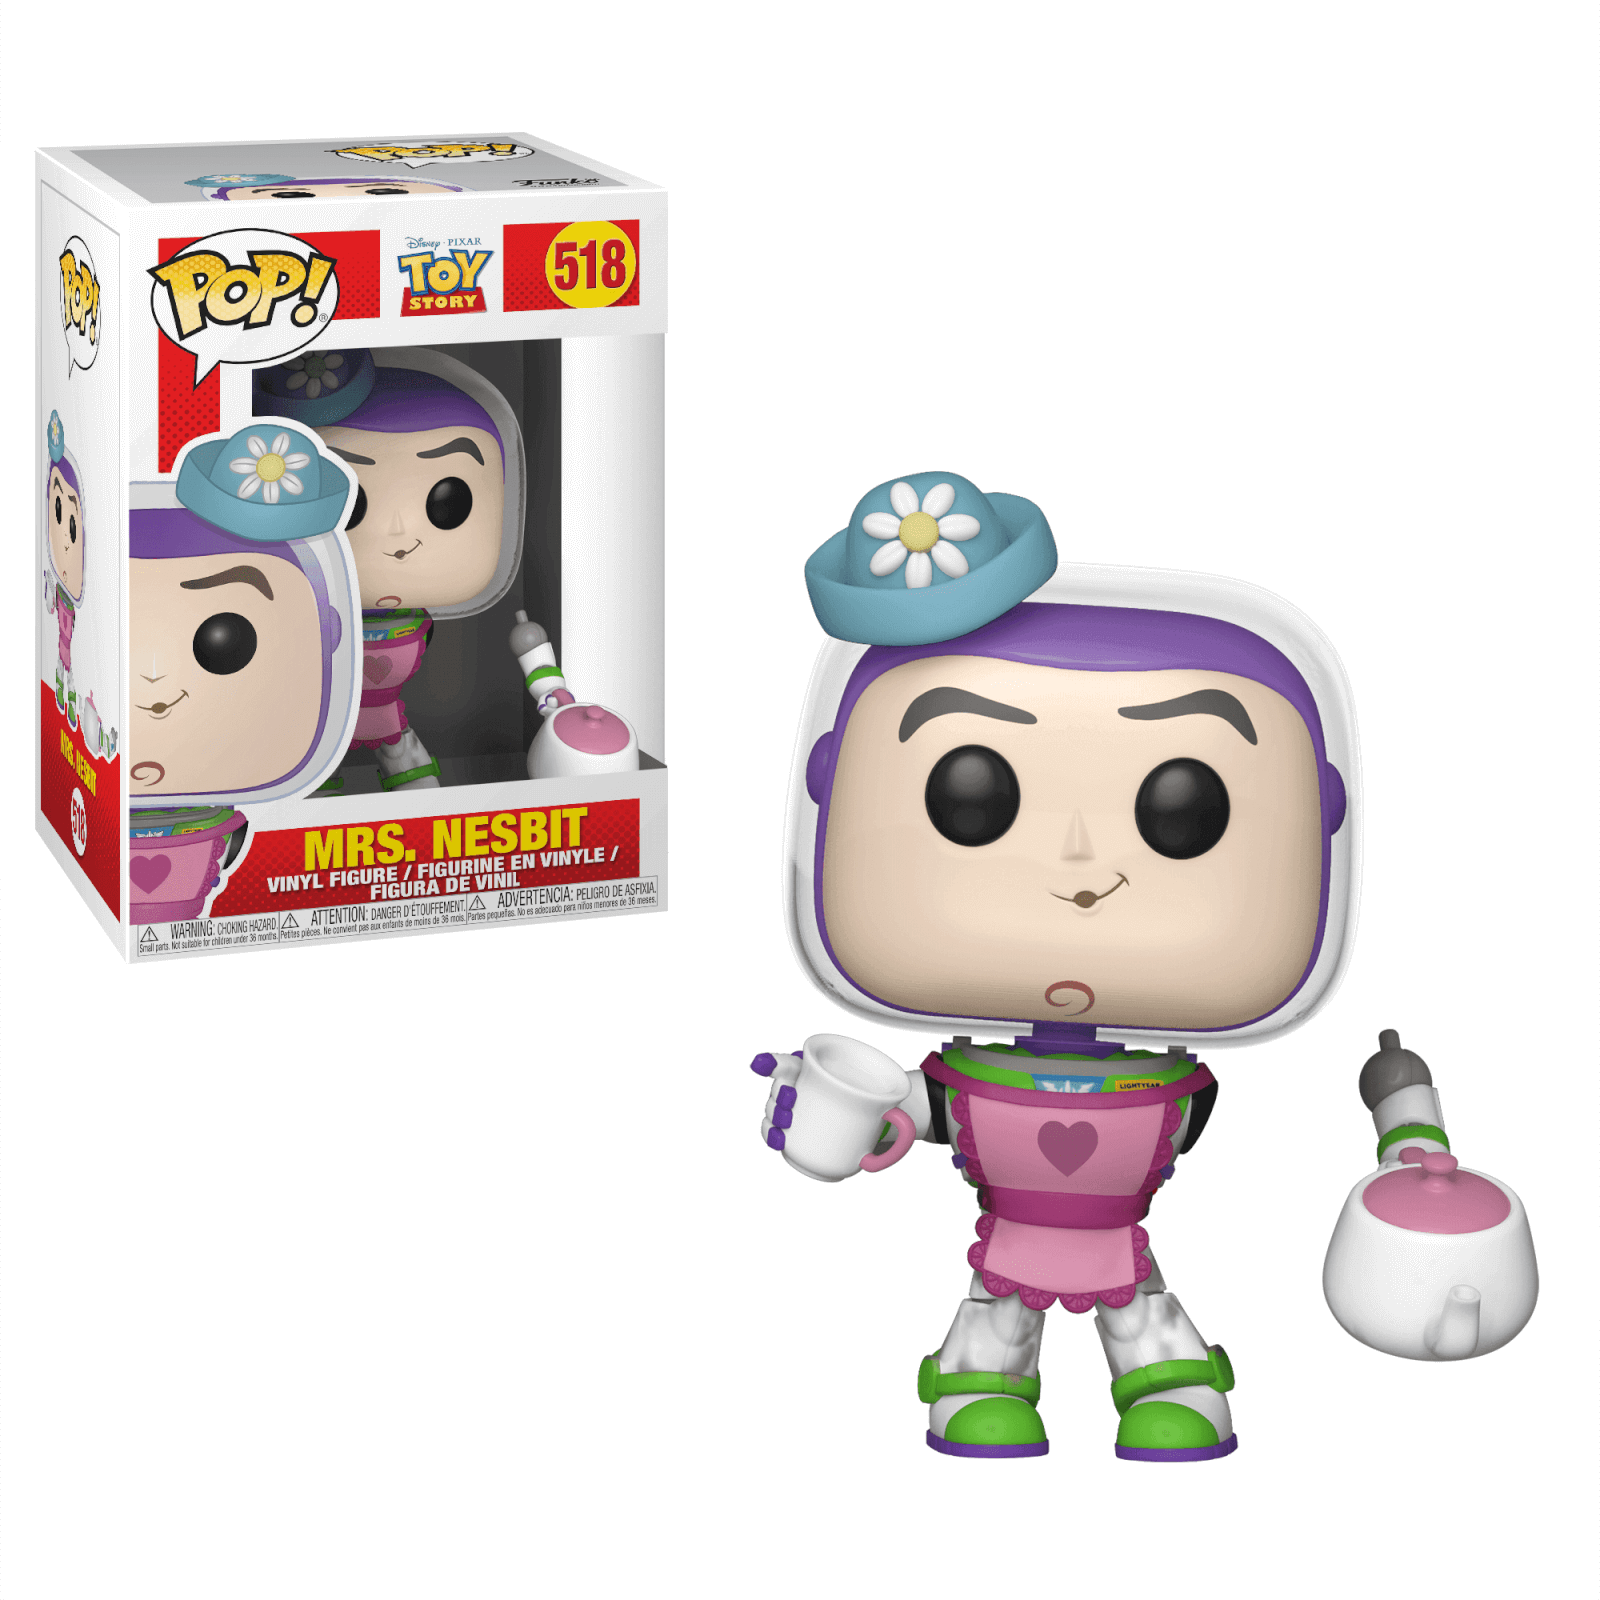 85c3edf773739 Figura Funko Pop! Sra. Nesbitt - Toy Story Merchandise